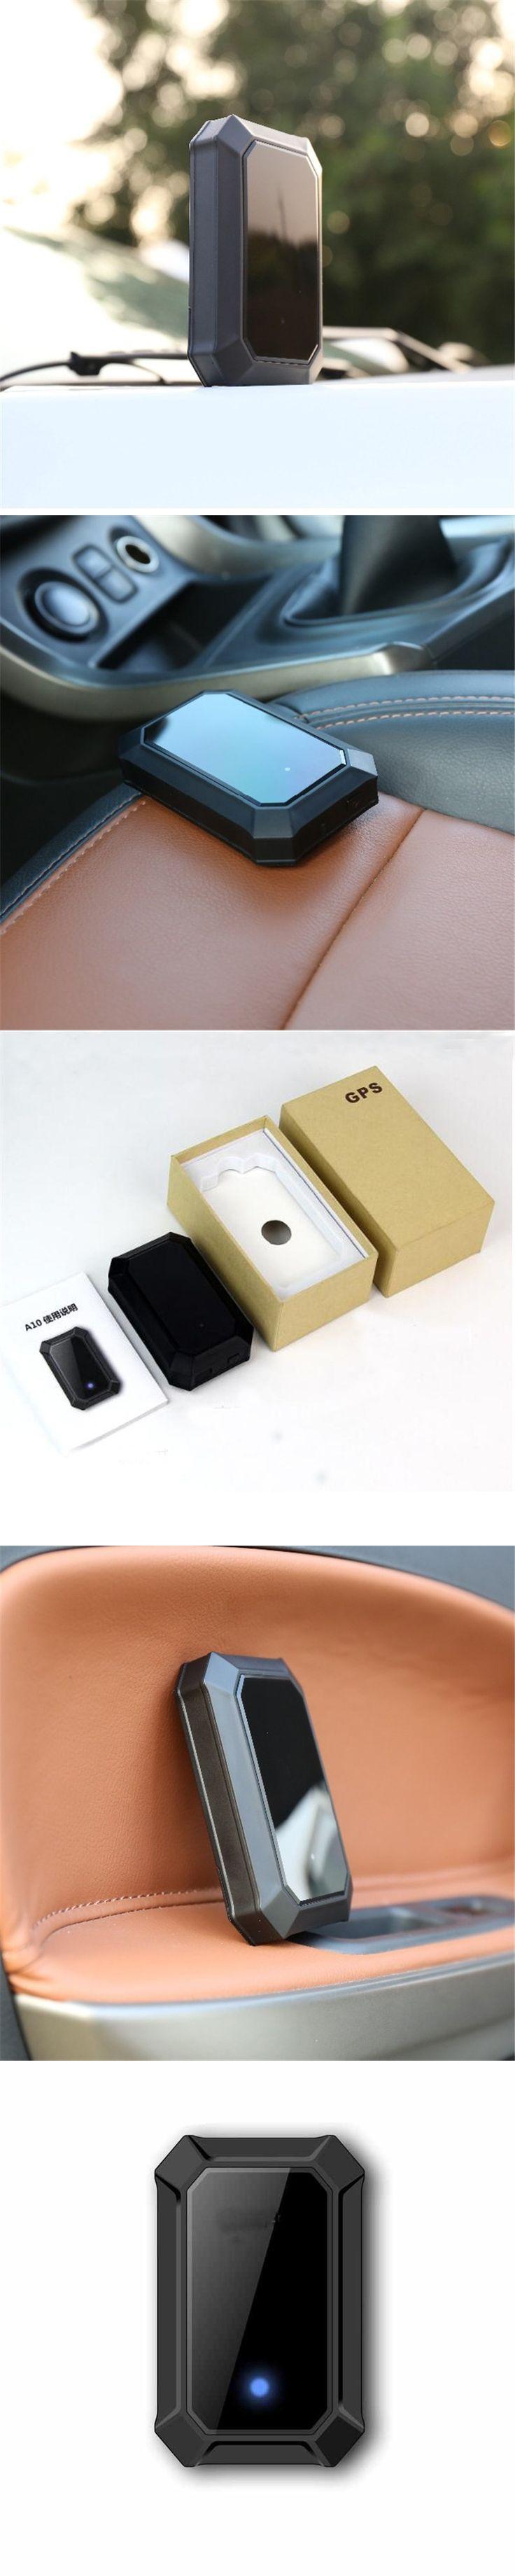 Car GSM Tracker Rastreador GPS Track for Car Bicycle Vehicle Google map 5000mah long battery life Sound Alarm Vibration Moveme